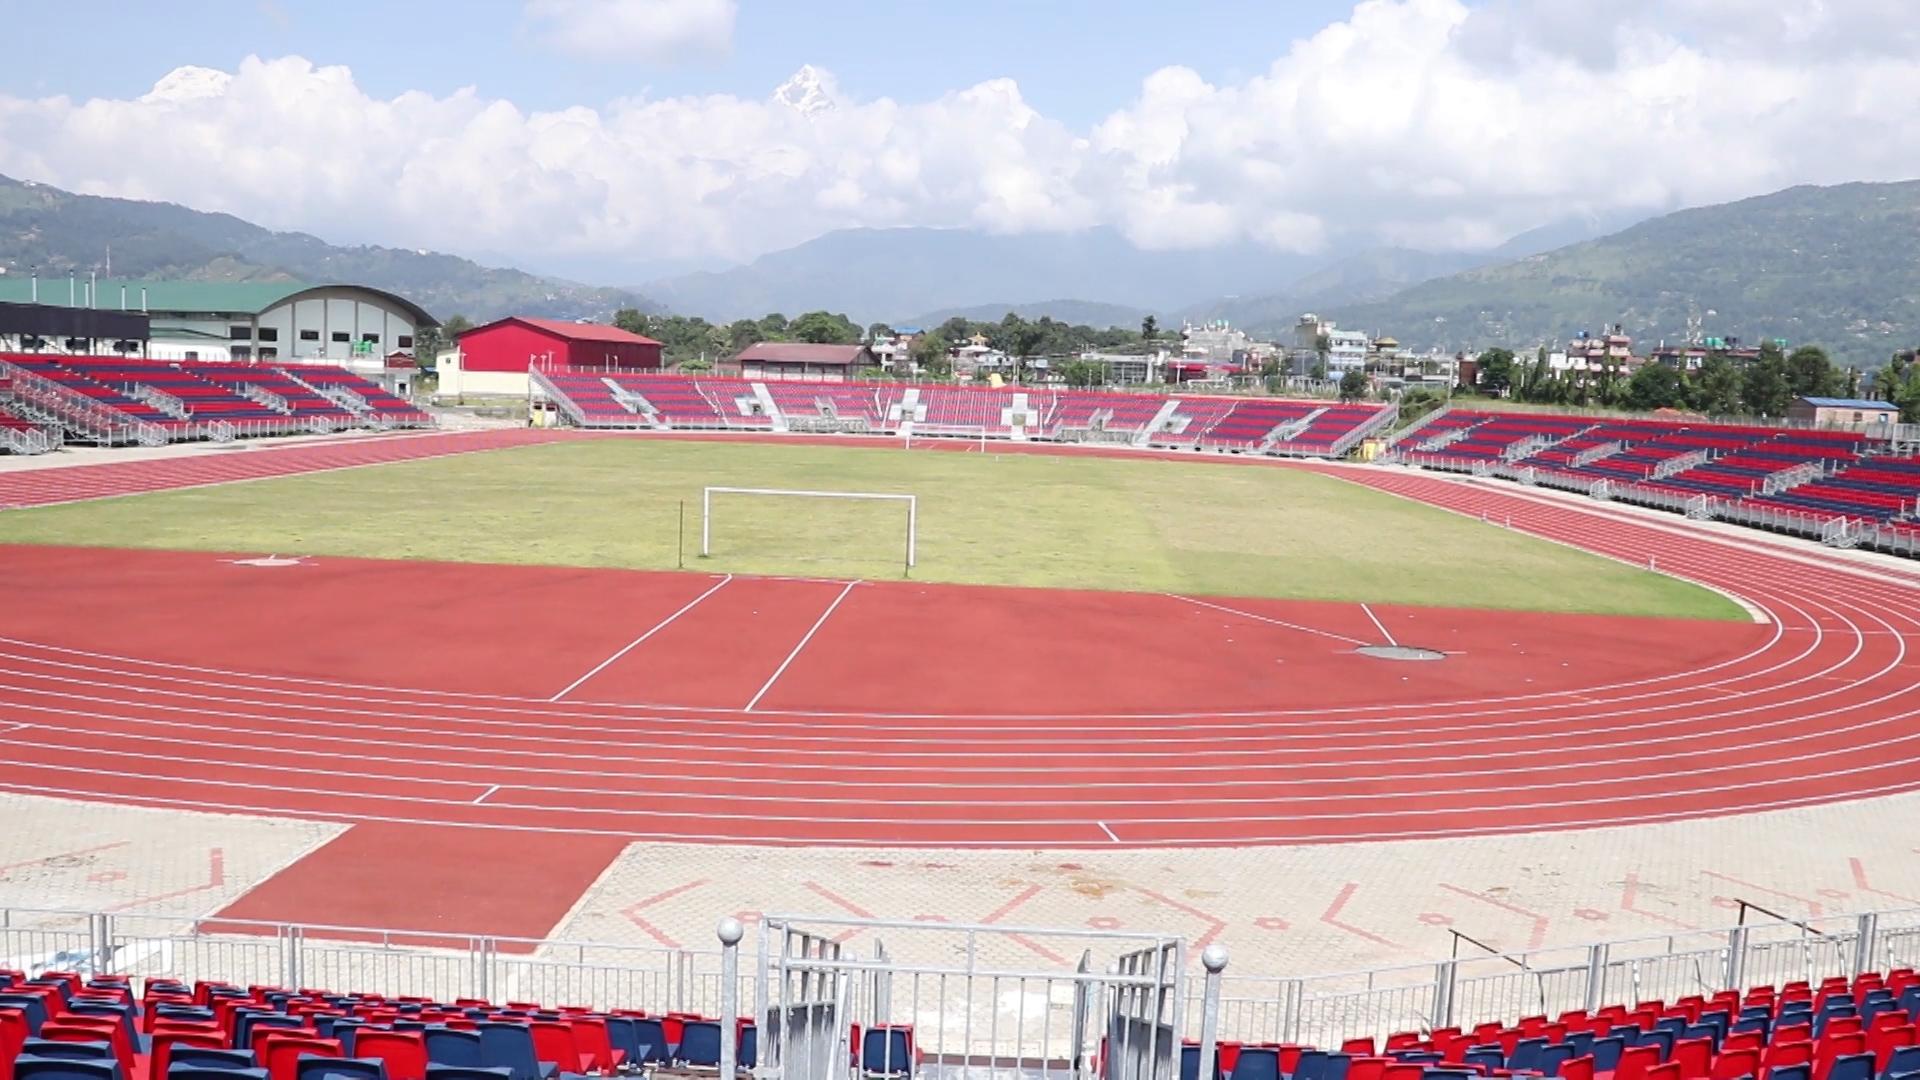 pokhara_stadium_1_Gpy7JrSSDH